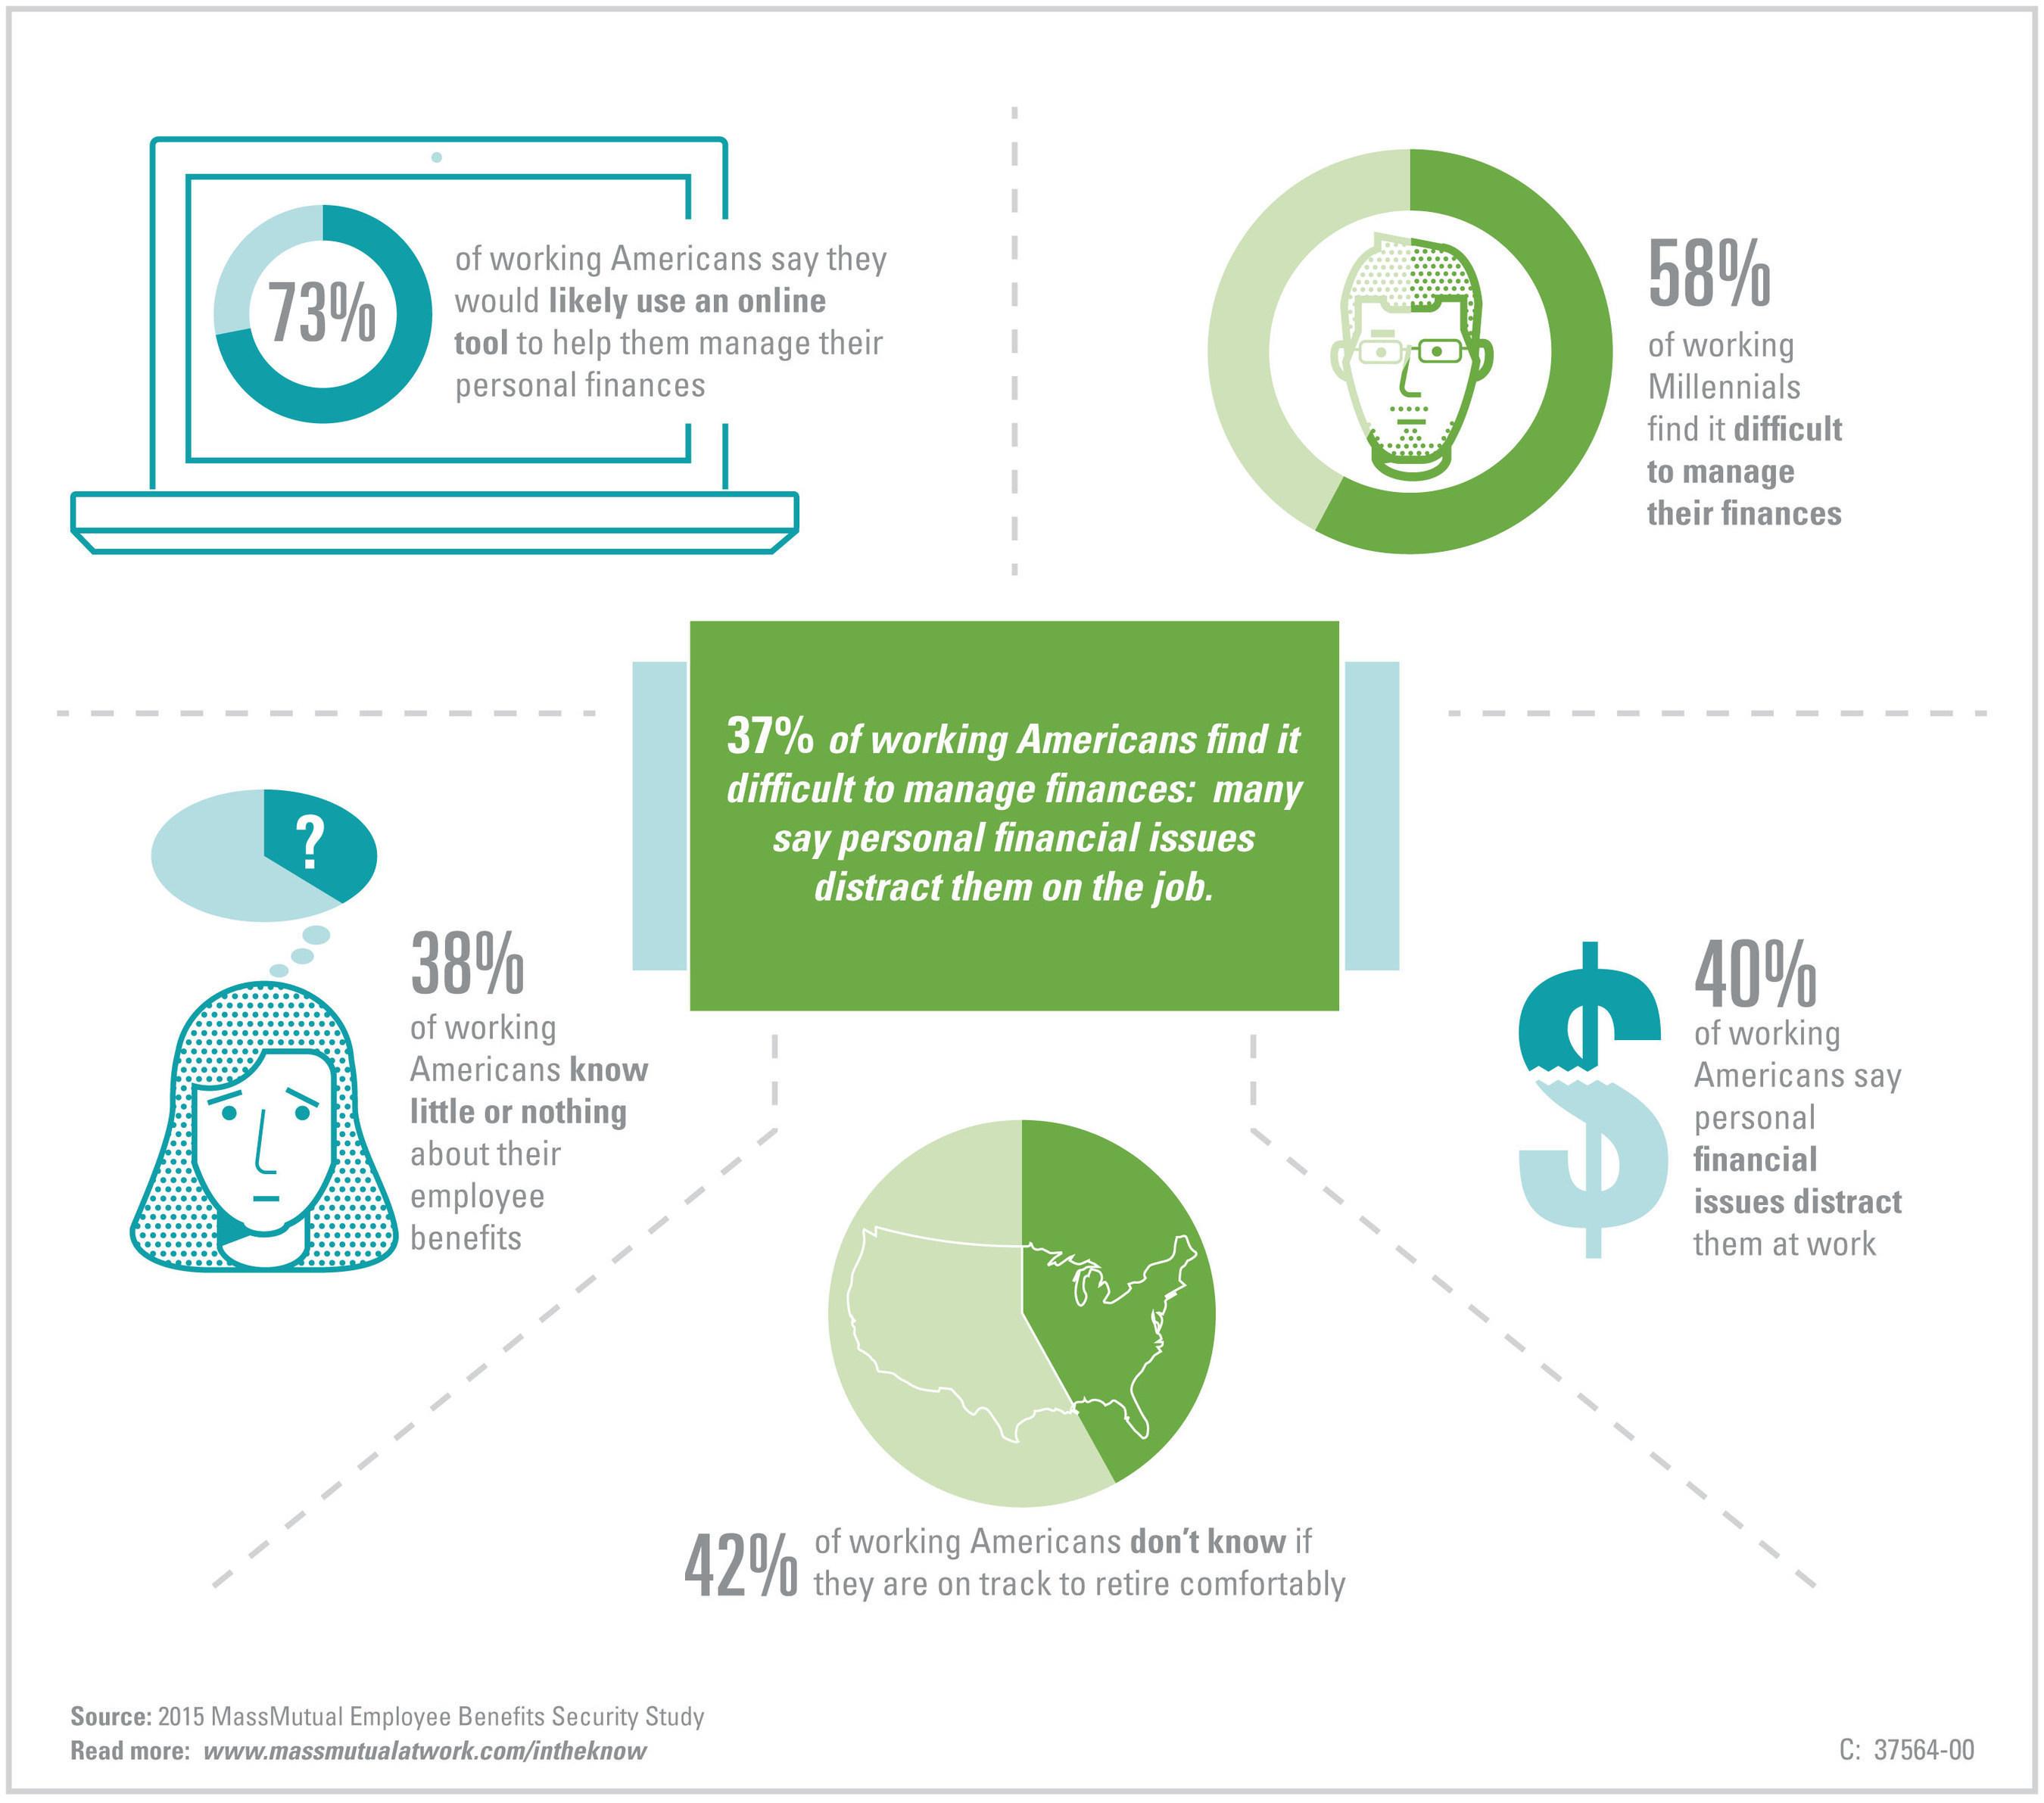 2015 MassMutual Employee Benefits Security Study